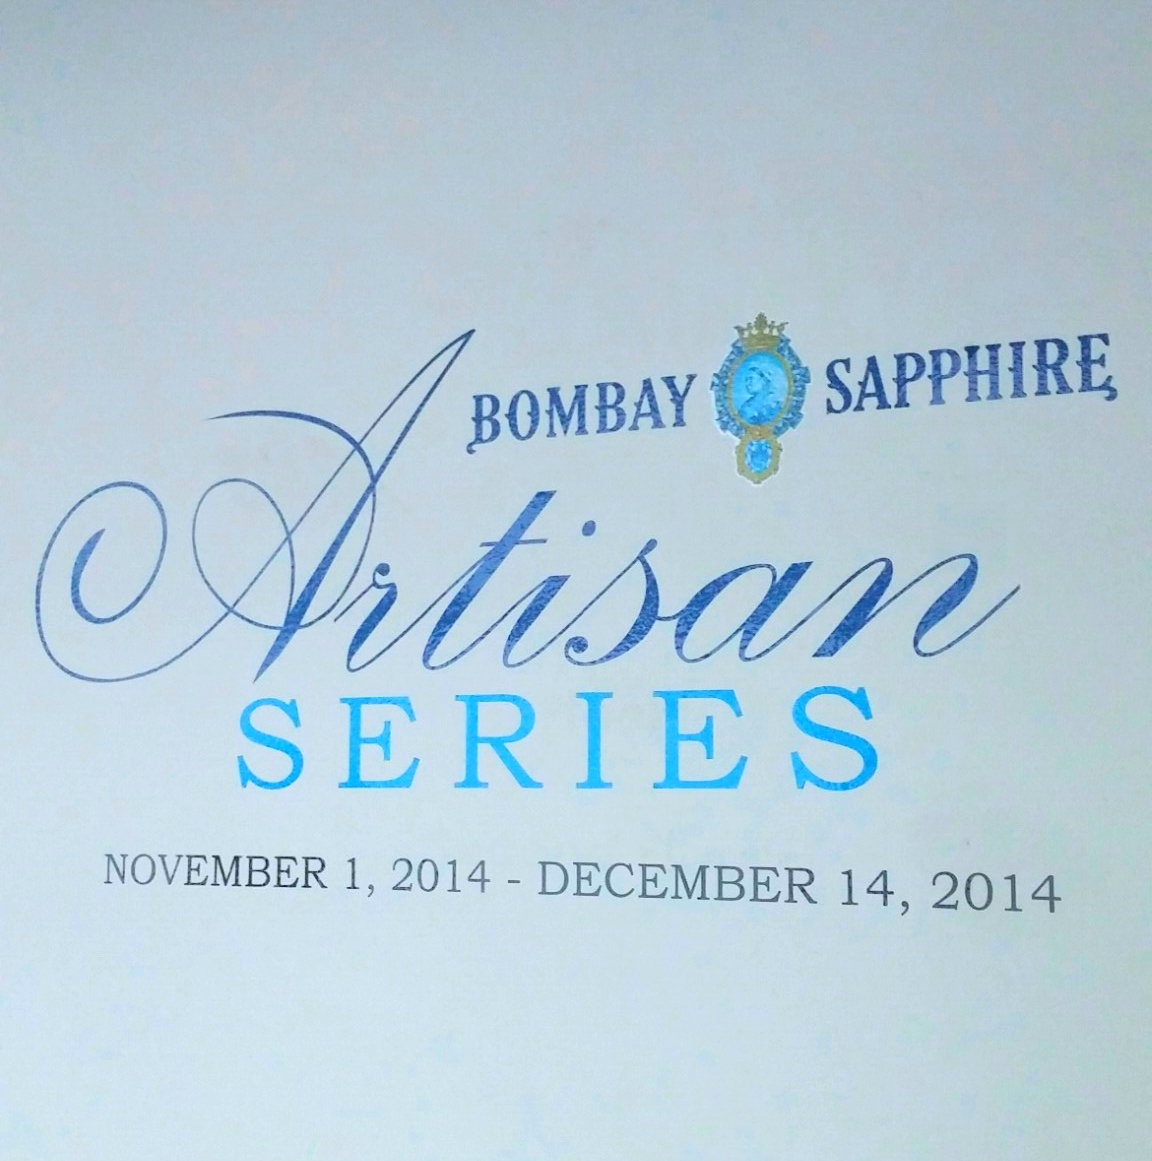 Houston Bombay Sapphire Artisan Series at the HMAAC